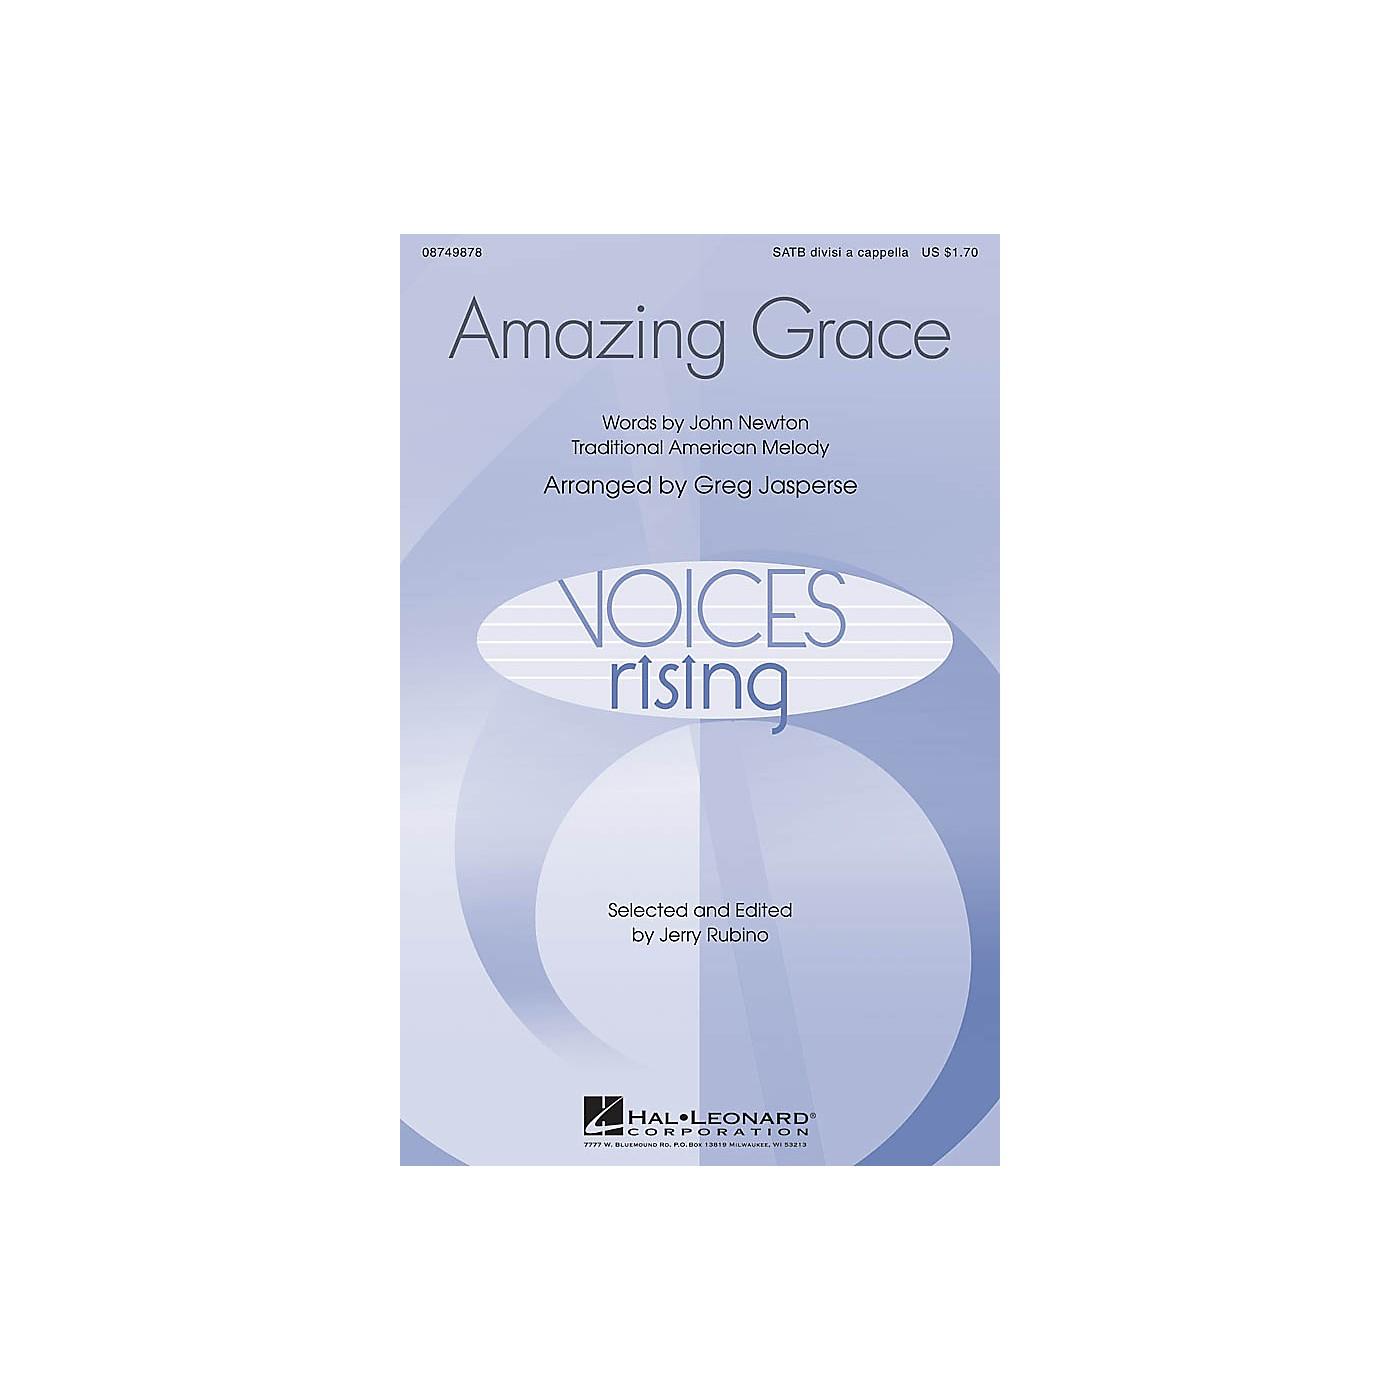 Hal Leonard Amazing Grace SATB DV A Cappella arranged by Greg Jasperse thumbnail